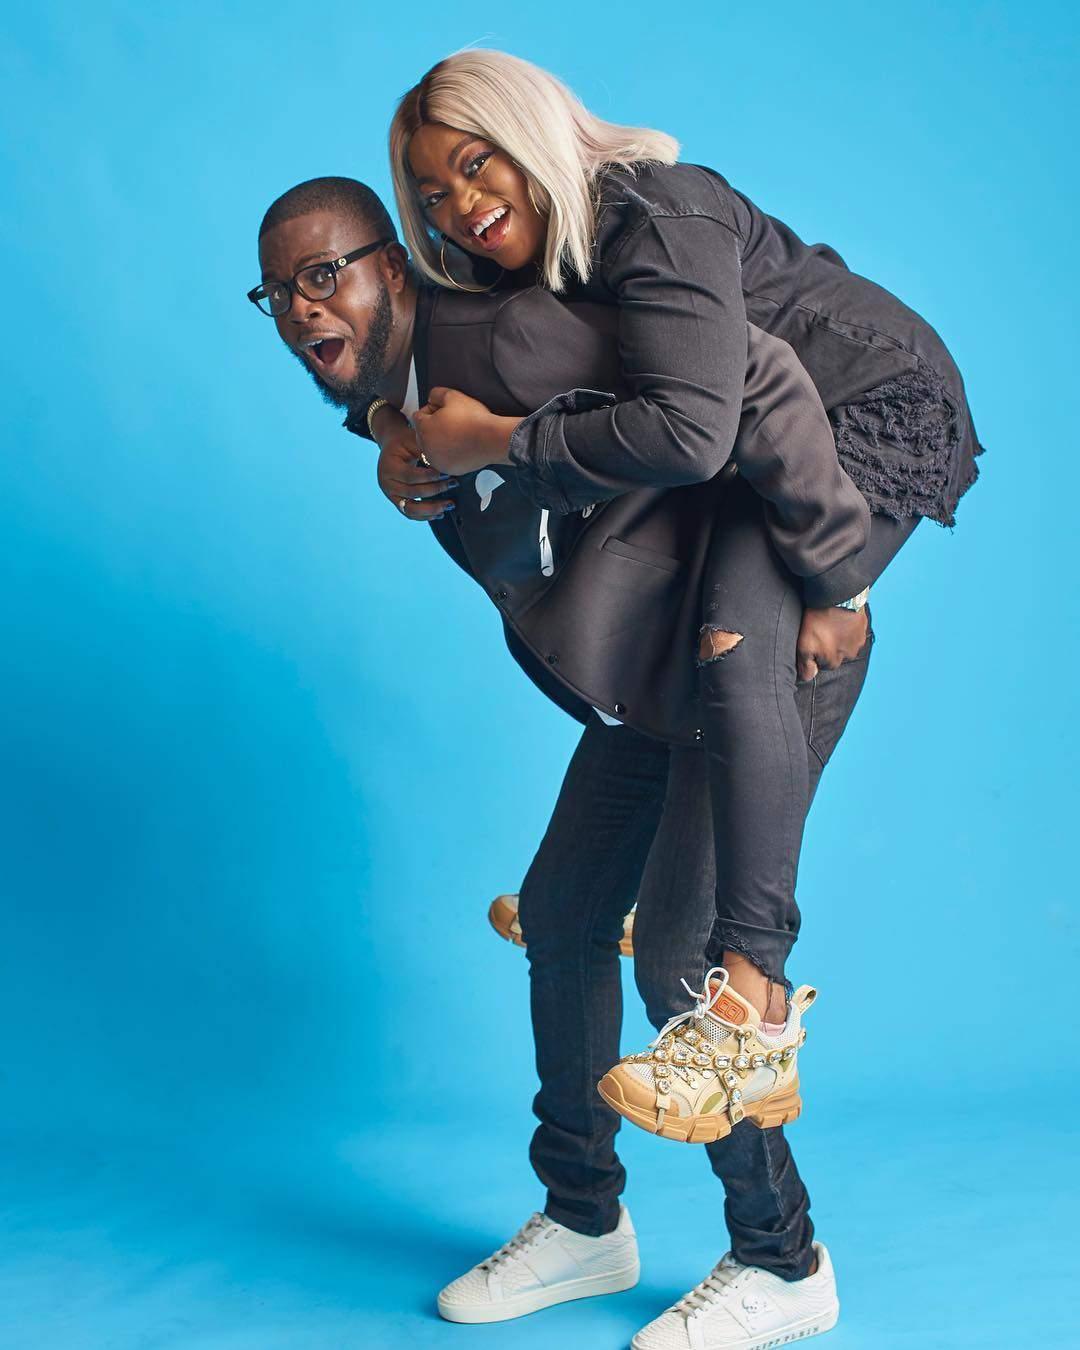 JJC Skillz And Funke Akindele Are Too Cute For Words In Birthday Shoot 3